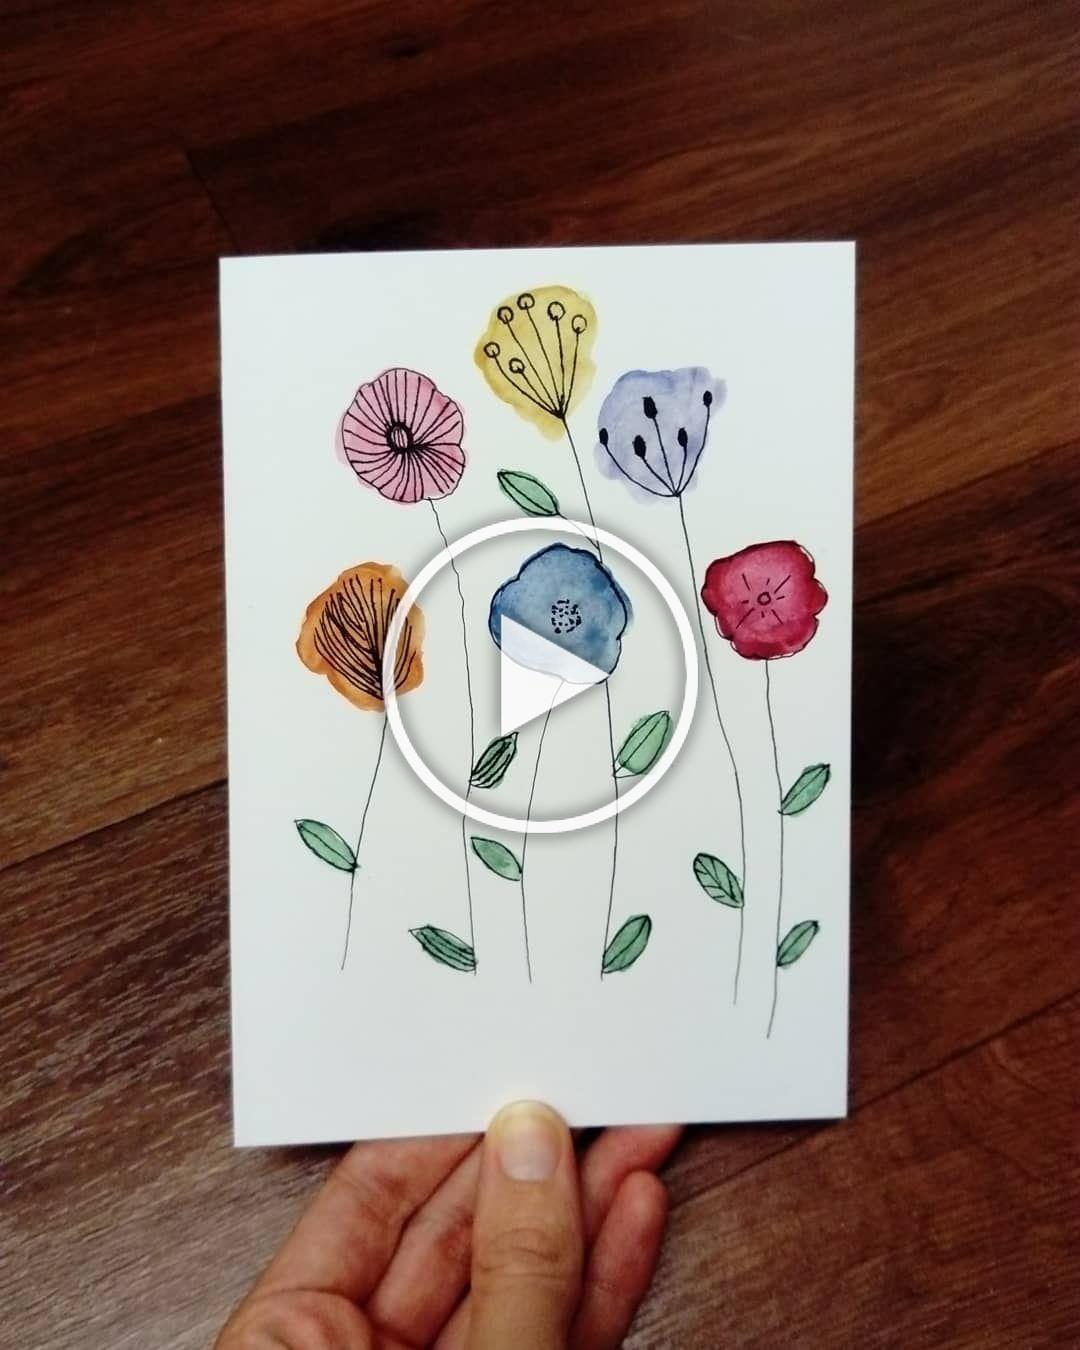 Pretty Watercolor Flowers #watercolor #flowers #painting#doodle #watercoloring